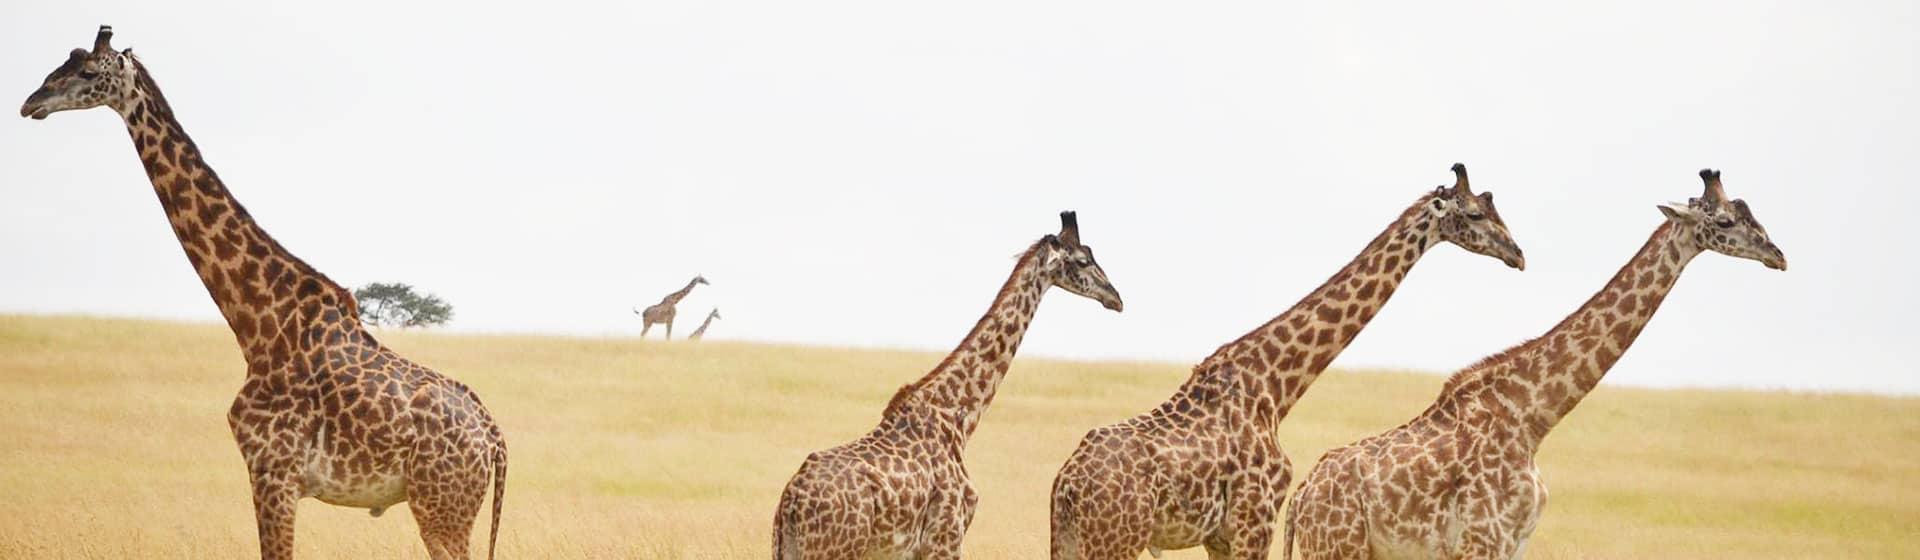 view Giraffe Family In masai mara national reserve with Asili Adventure Safaris